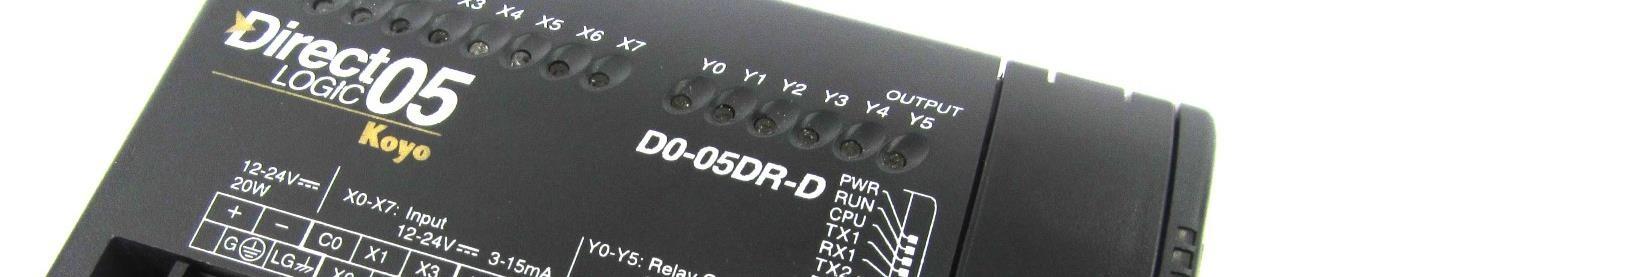 Direct Logic PLC